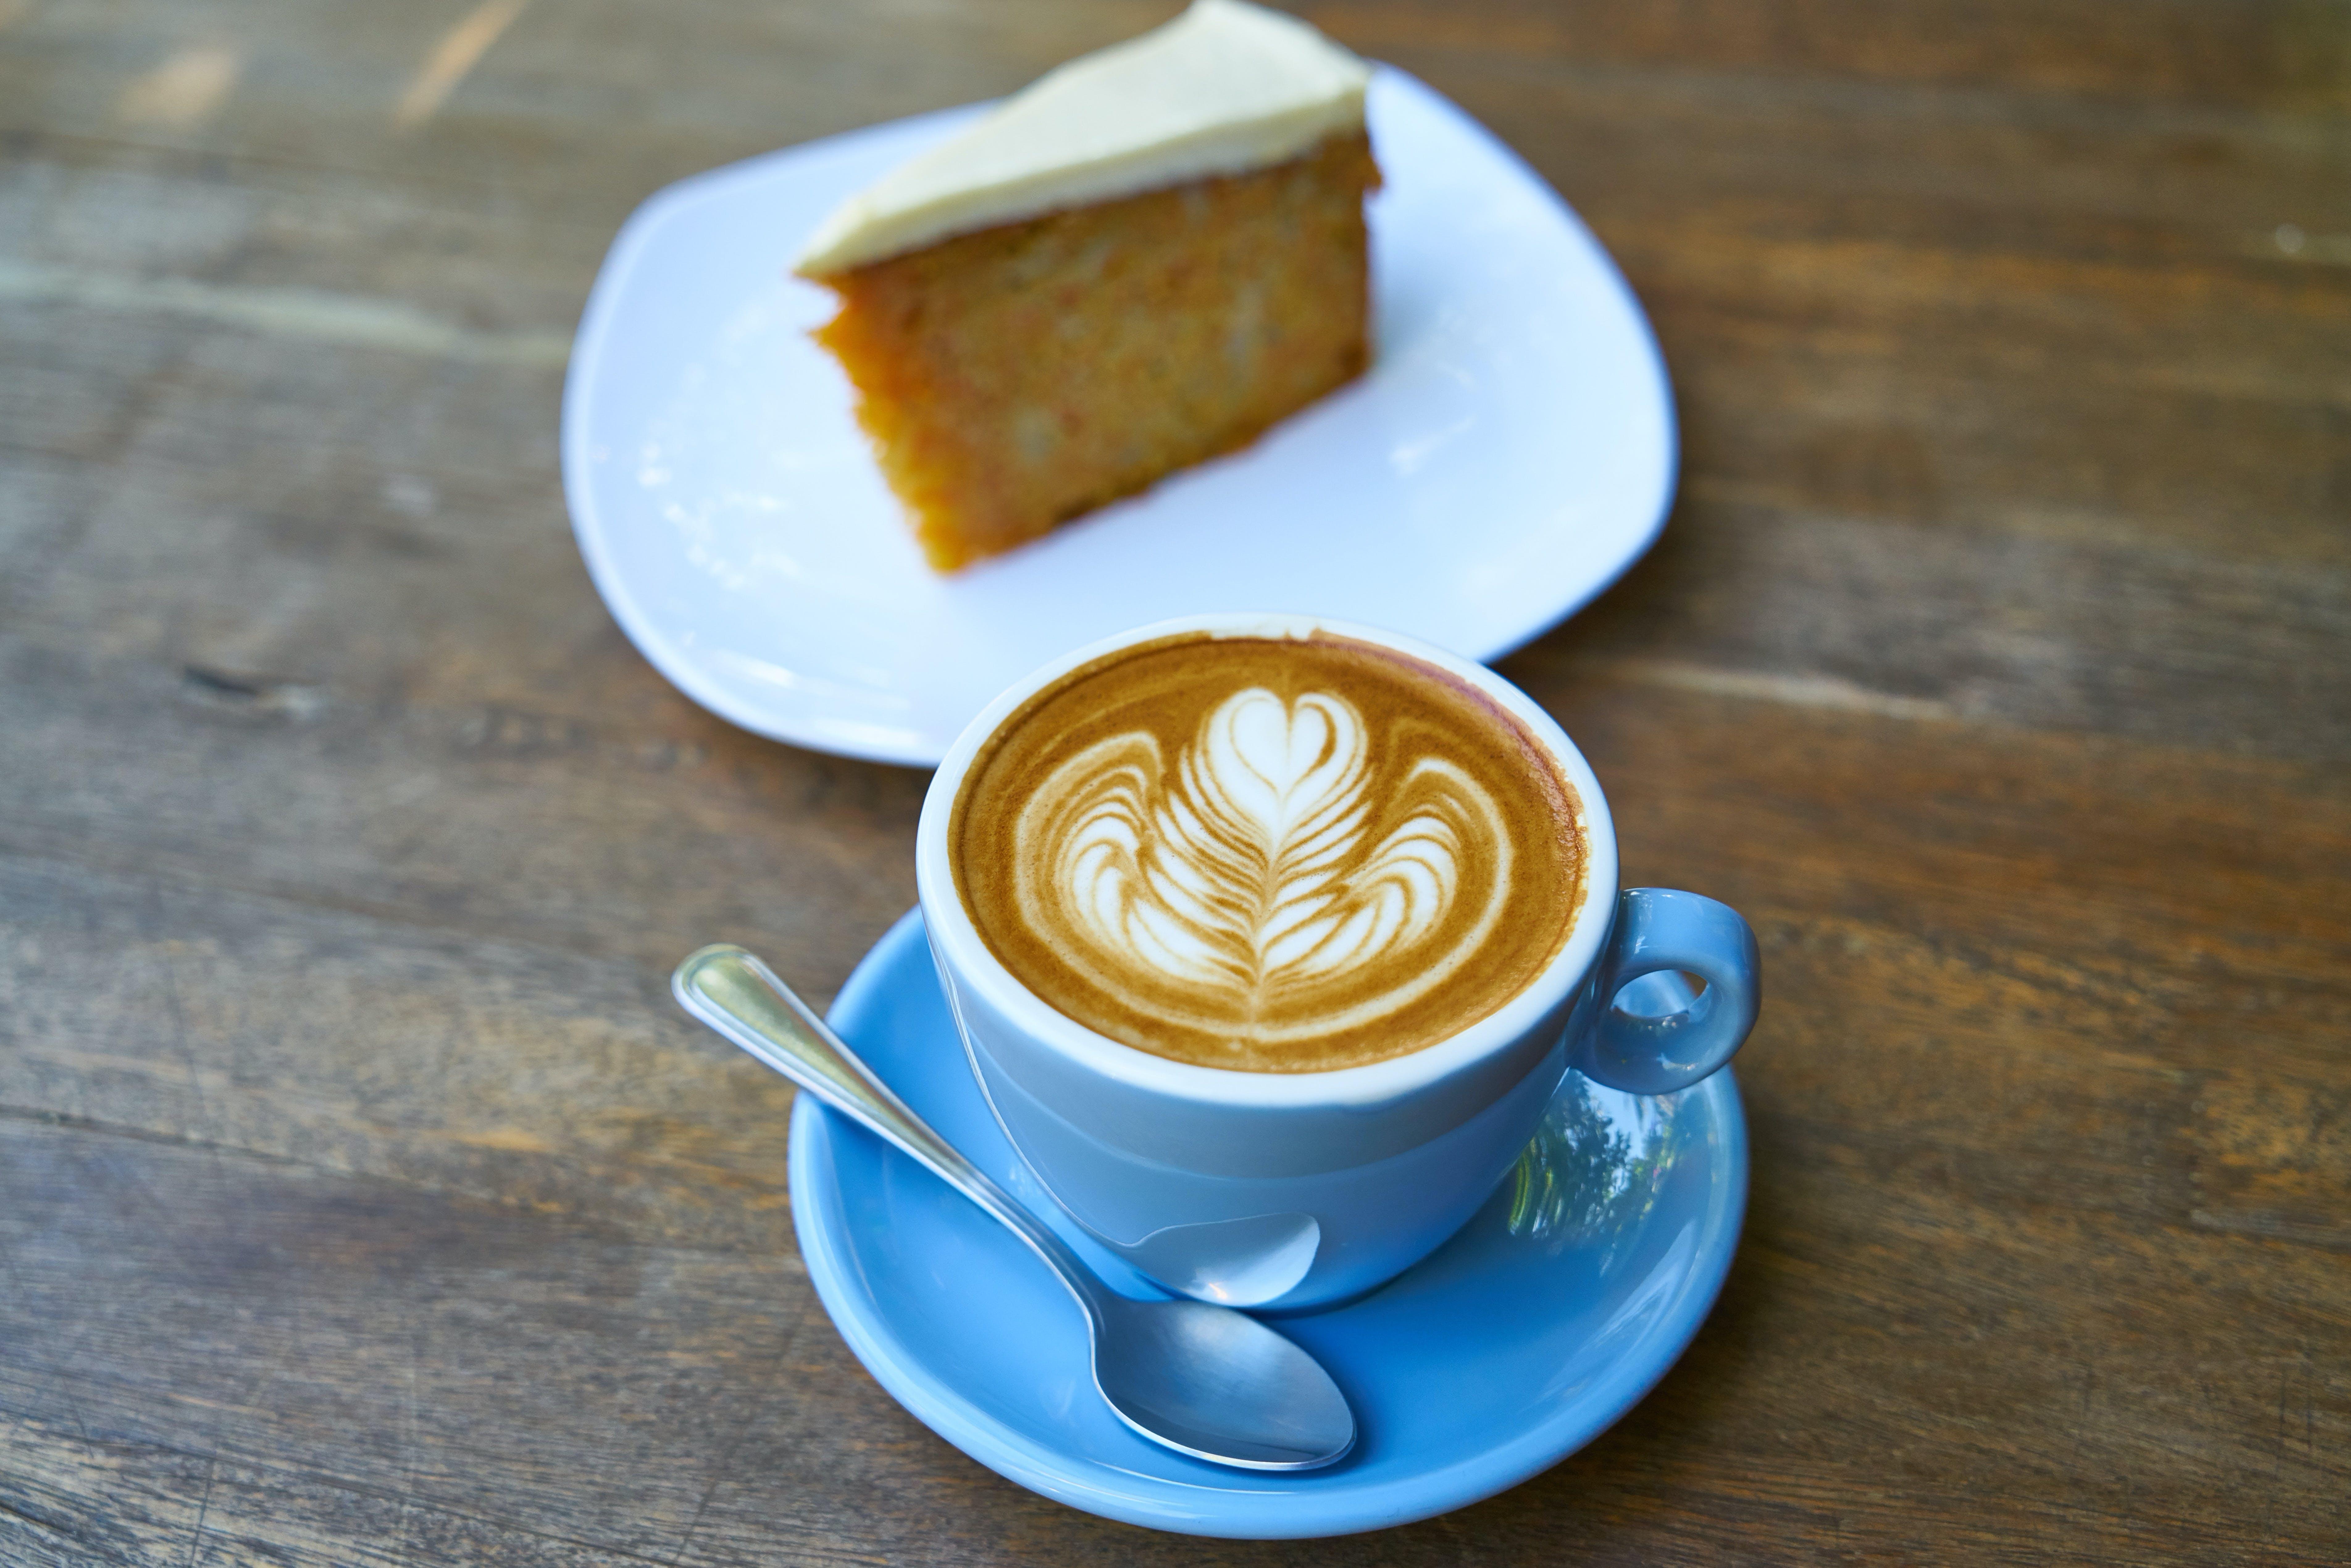 Cappuccino Beside Sliced Cake